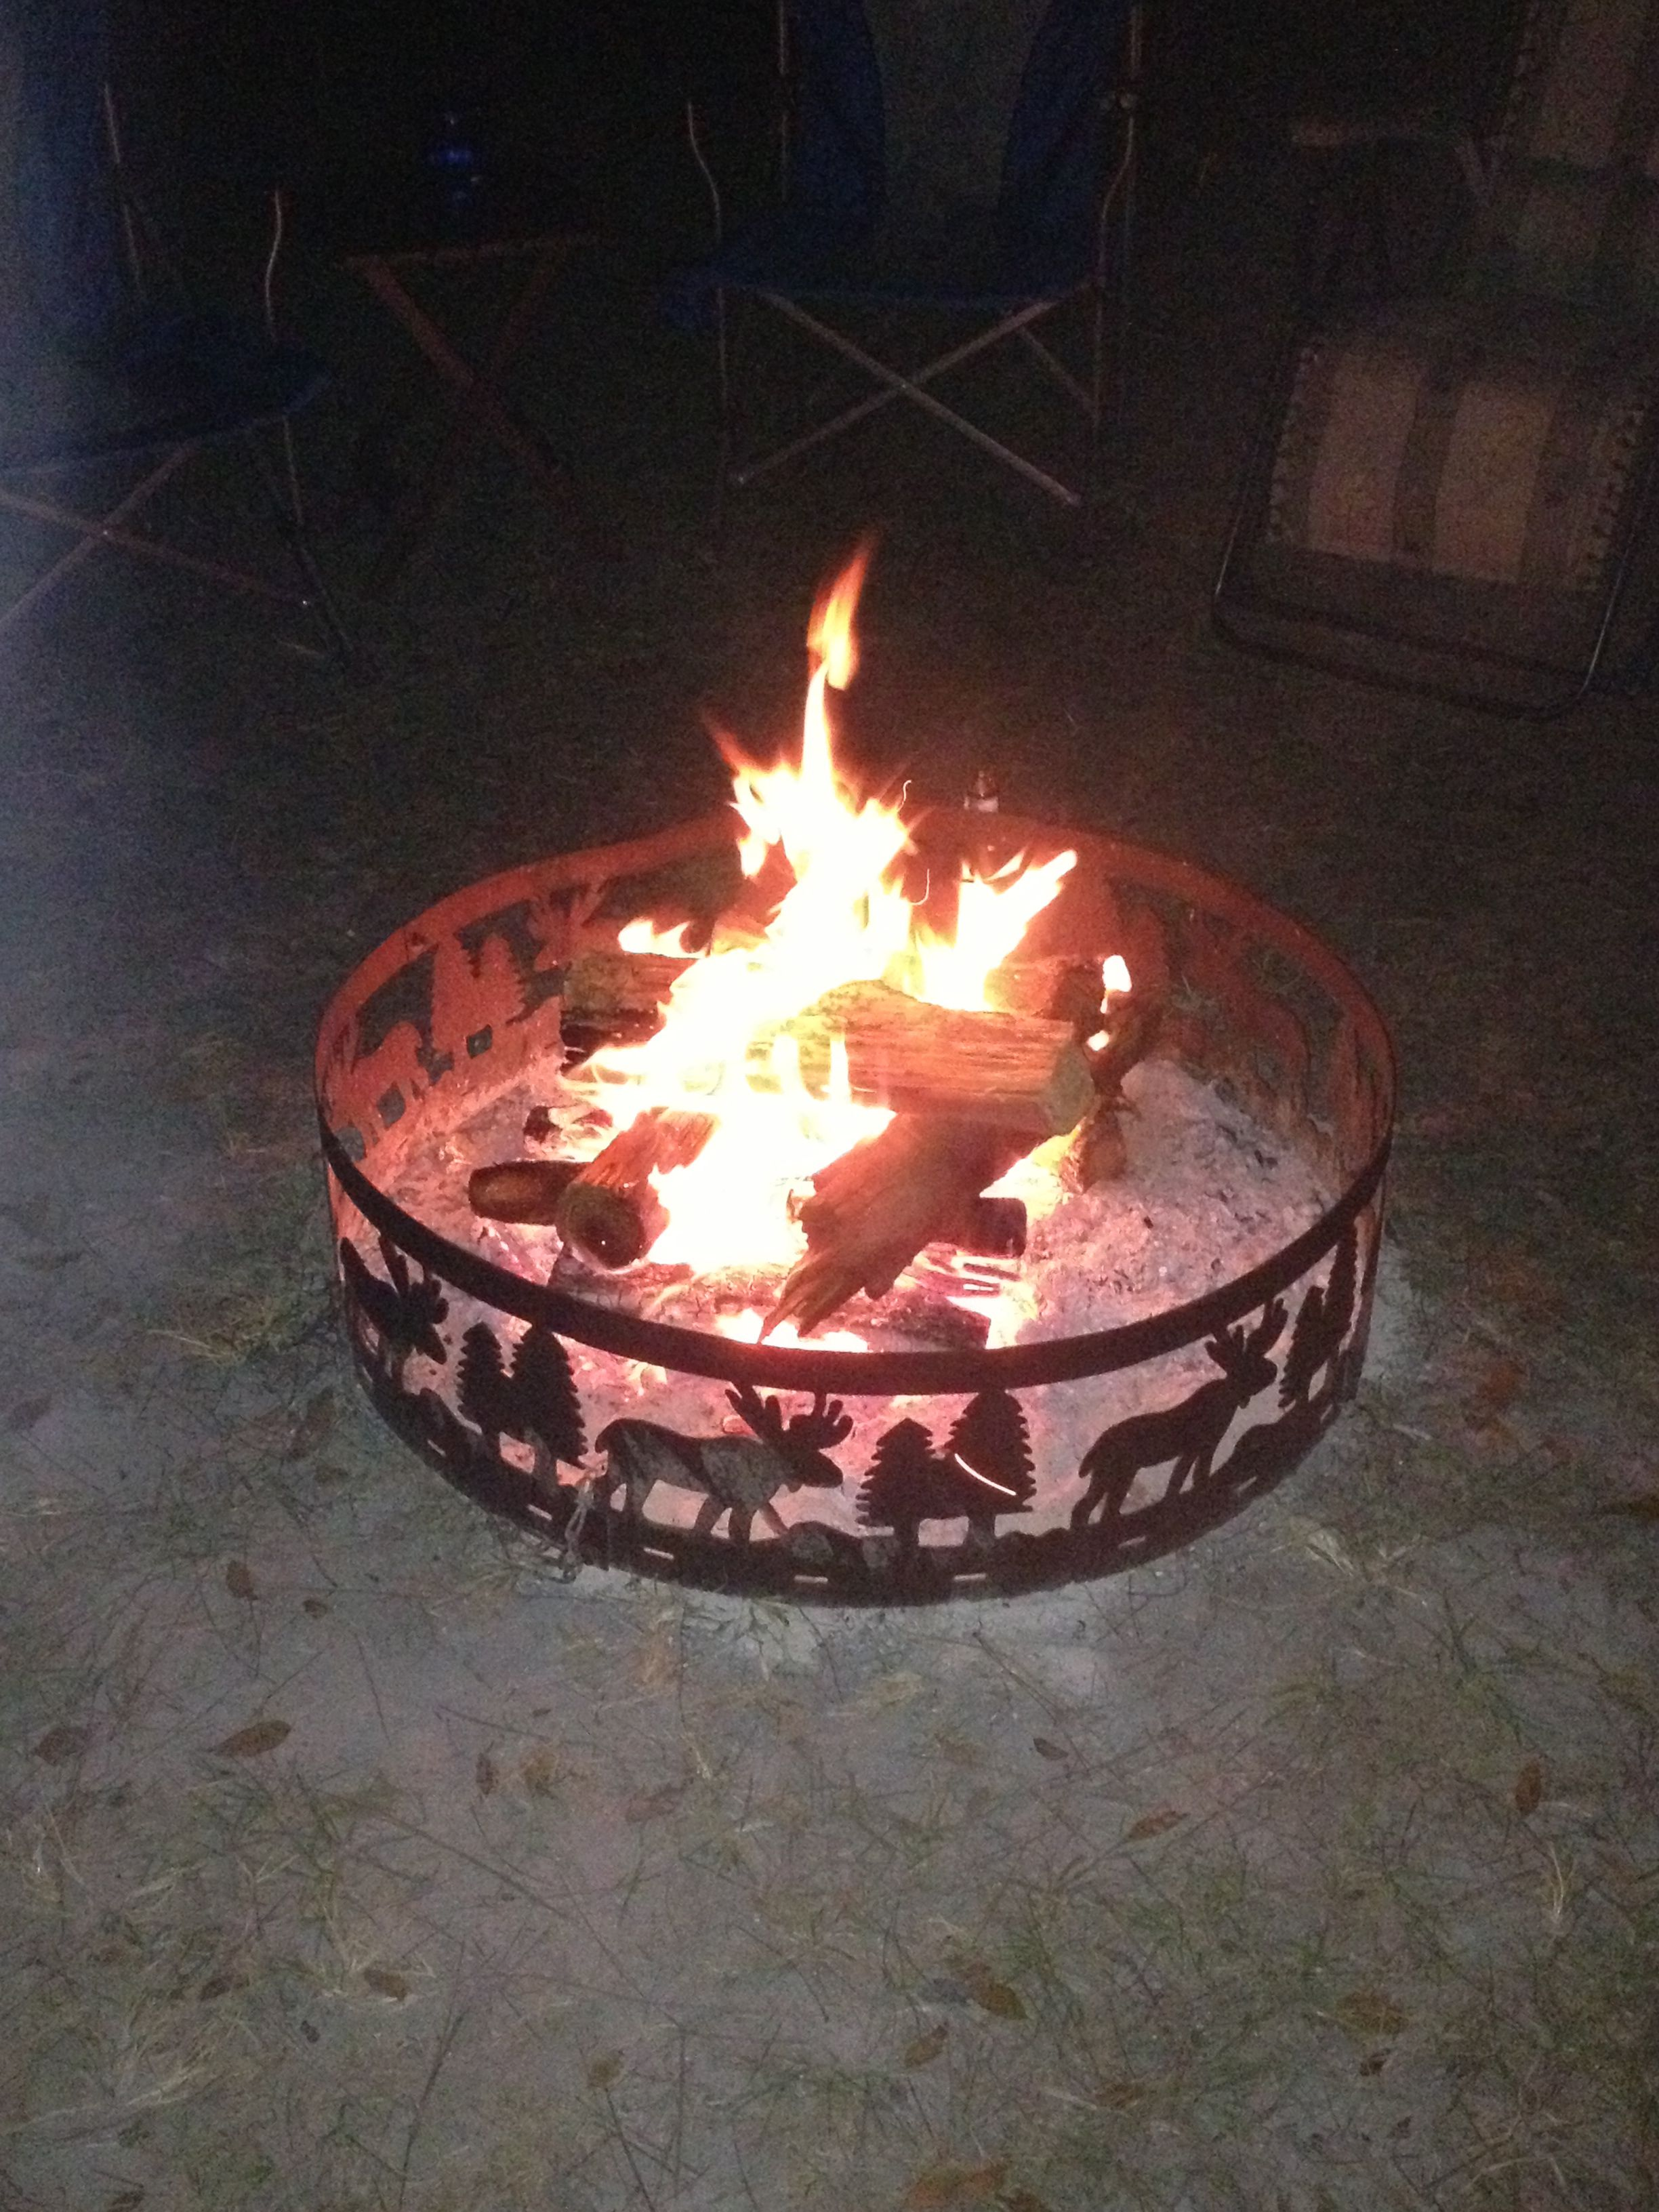 Nothing beats a good campfire...